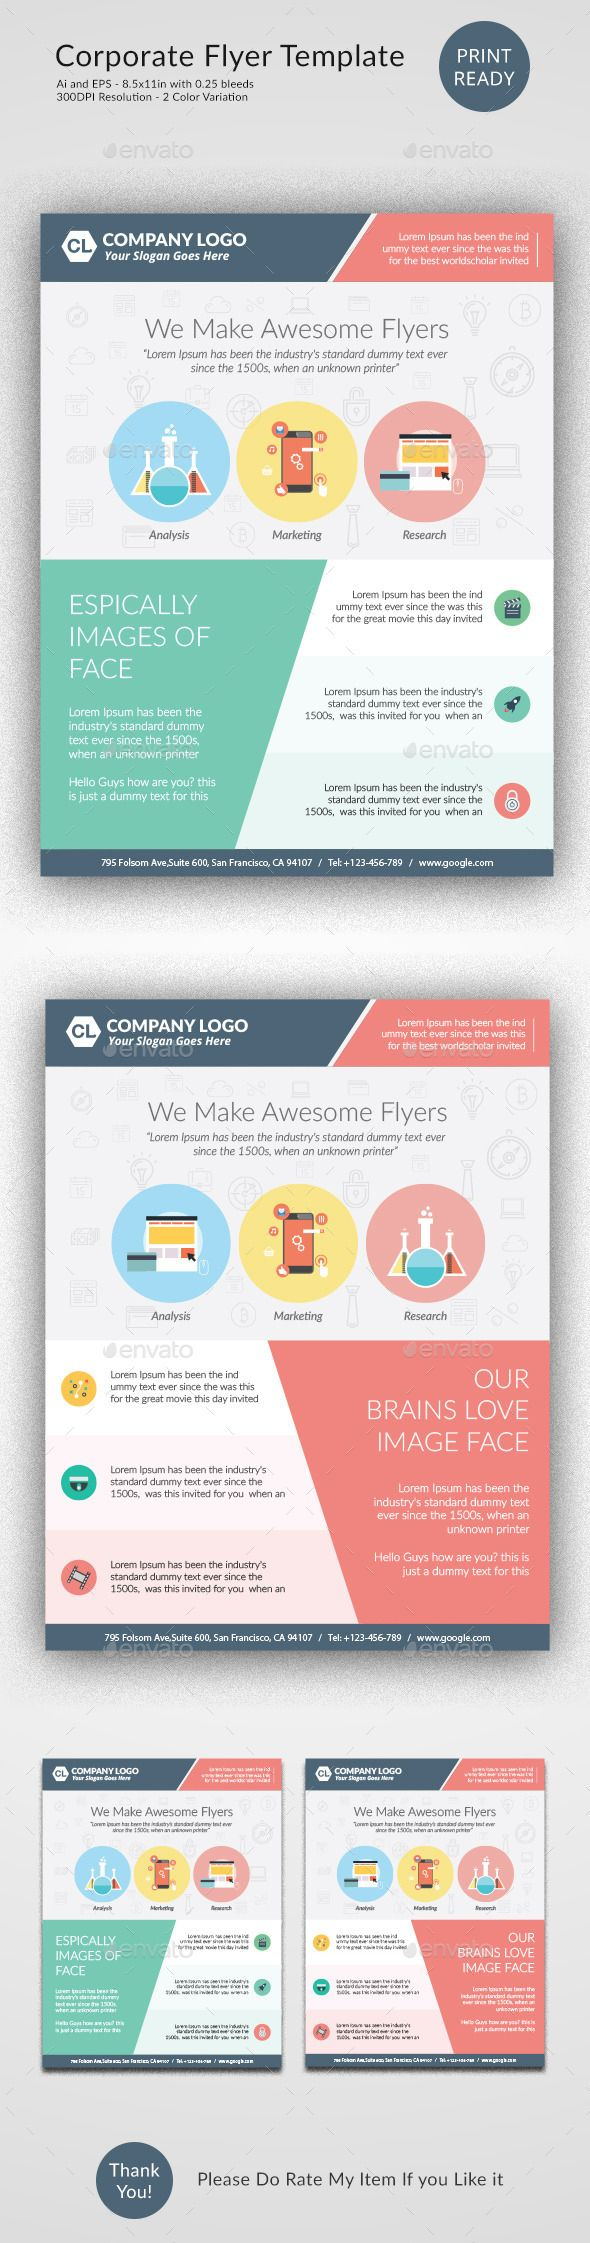 38 Best Promot Images On Pinterest Design Web Advertising And